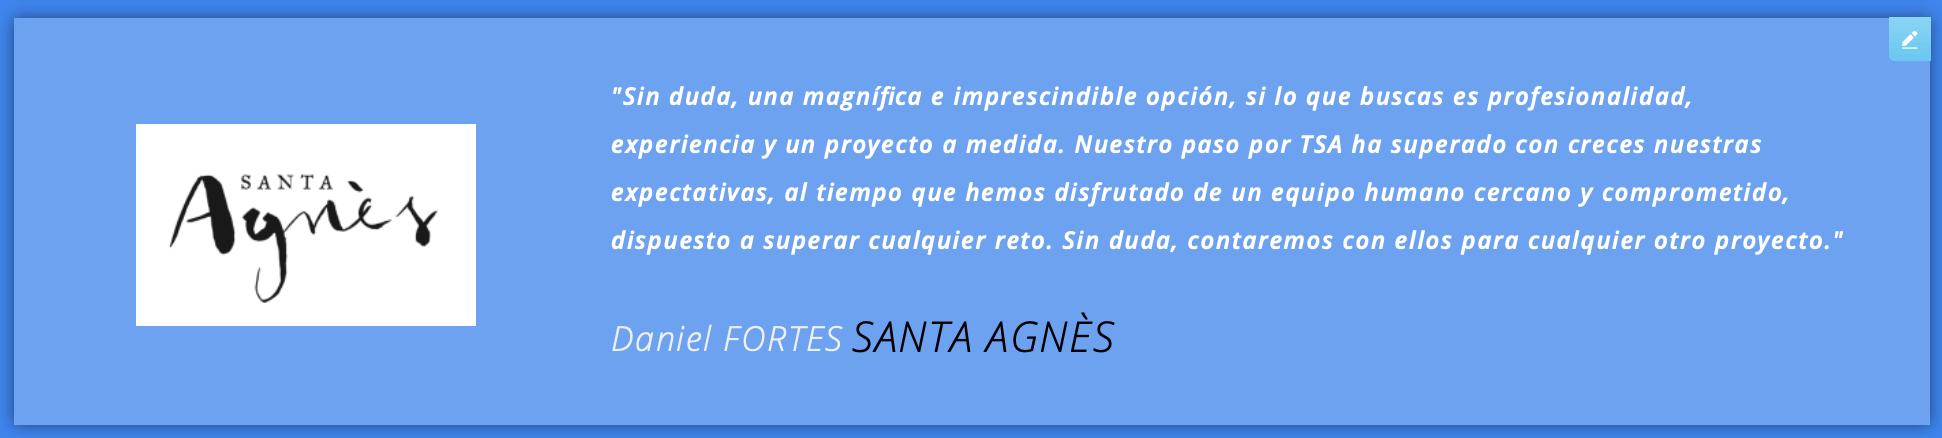 santa agnes